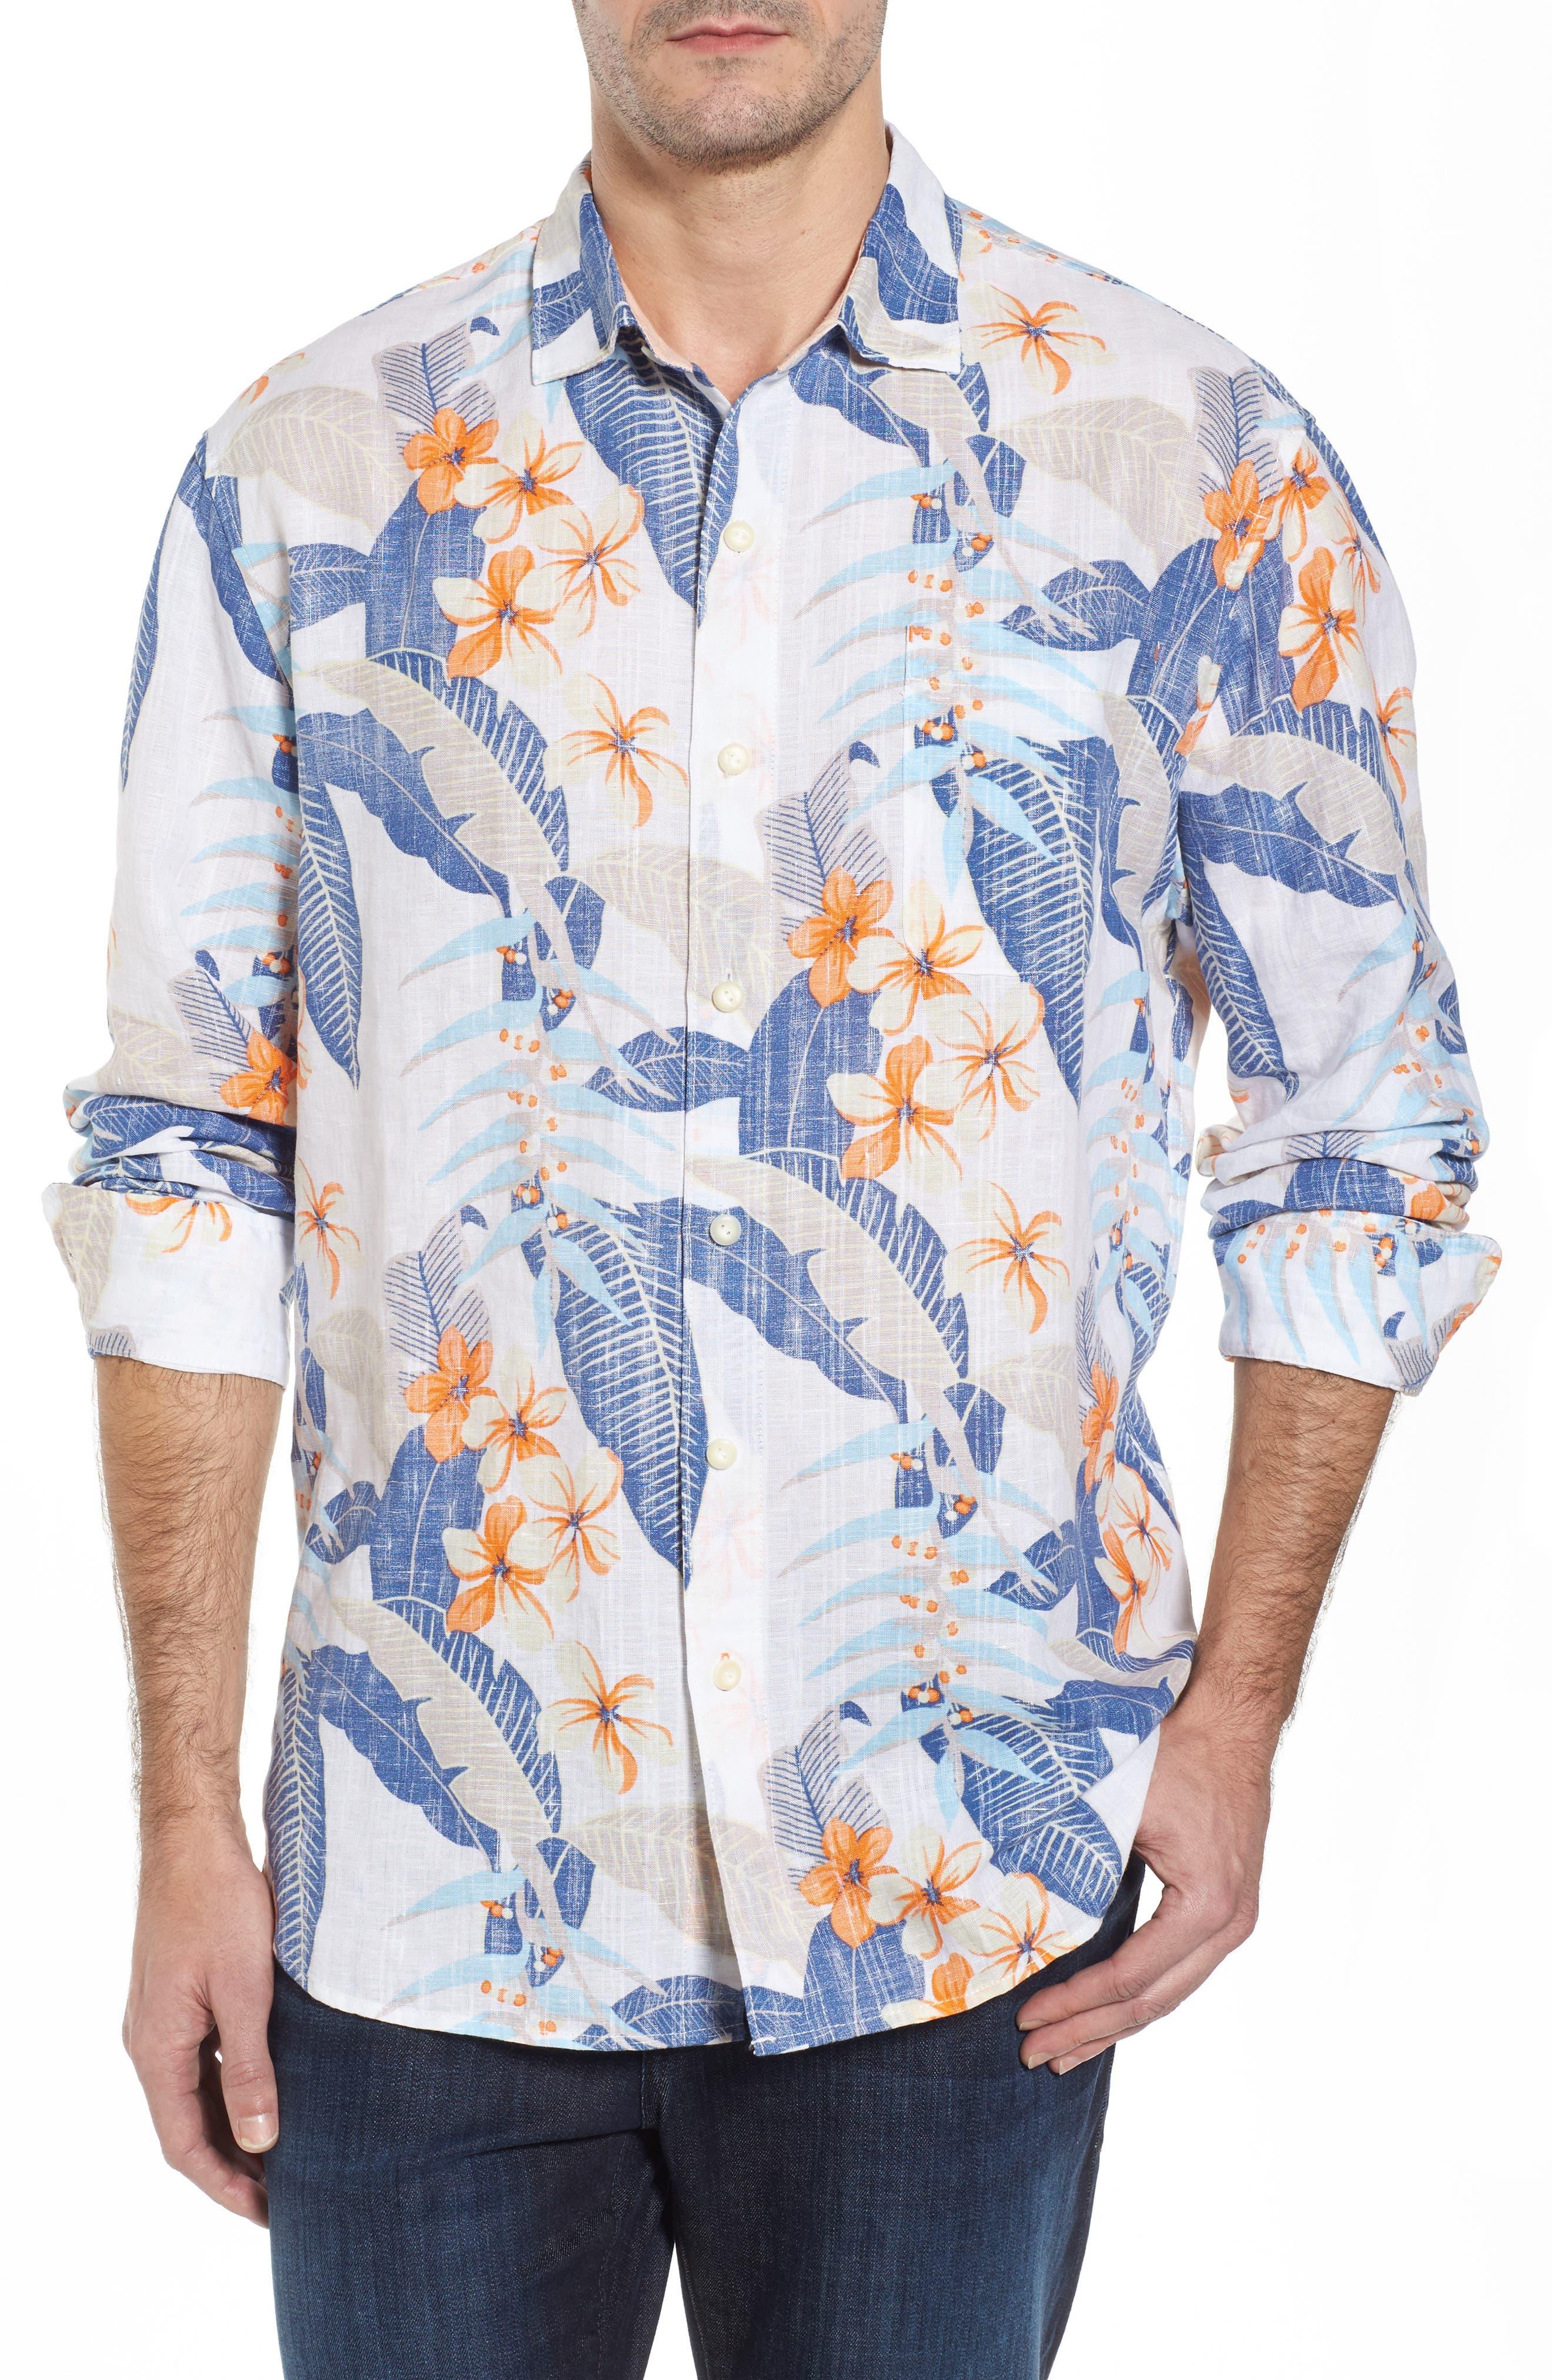 Main Image - Tommy Bahama Liviea Leaves Linen Blend Camp Shirt